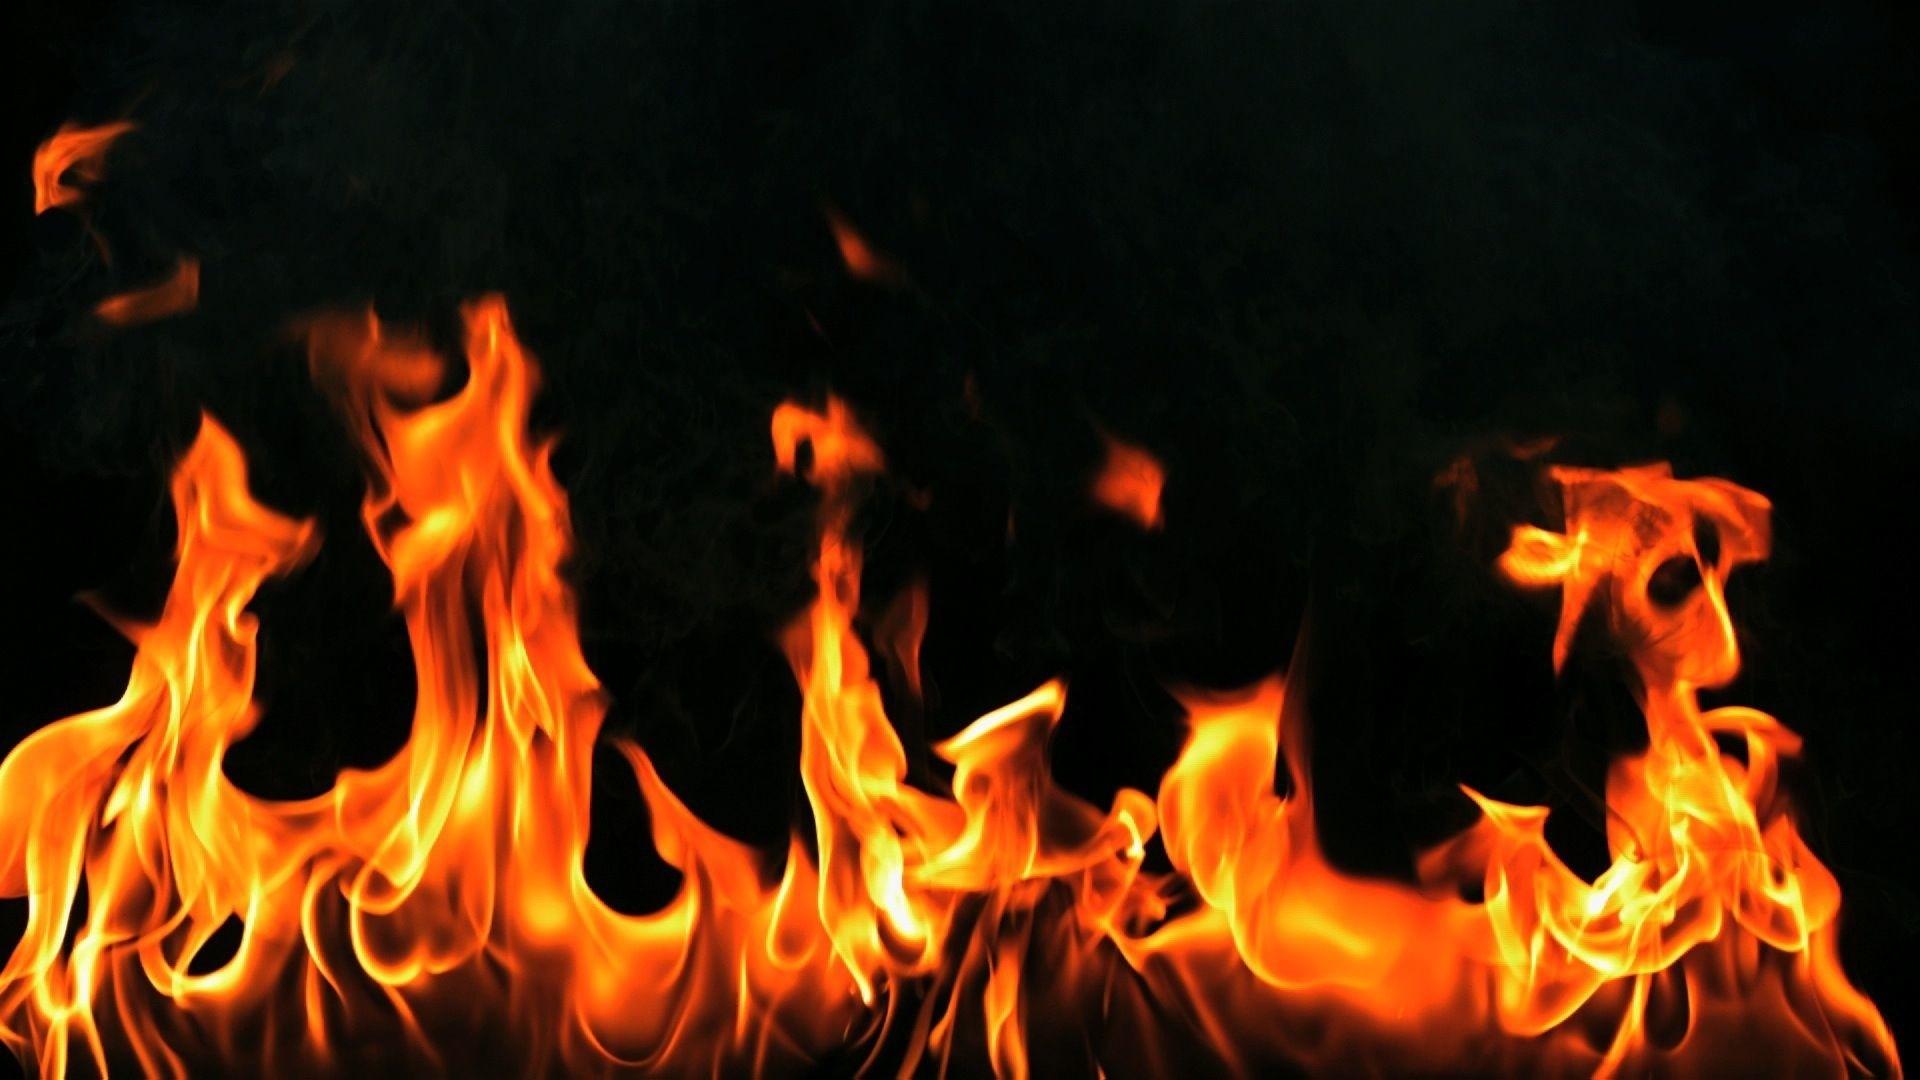 Flame Pic